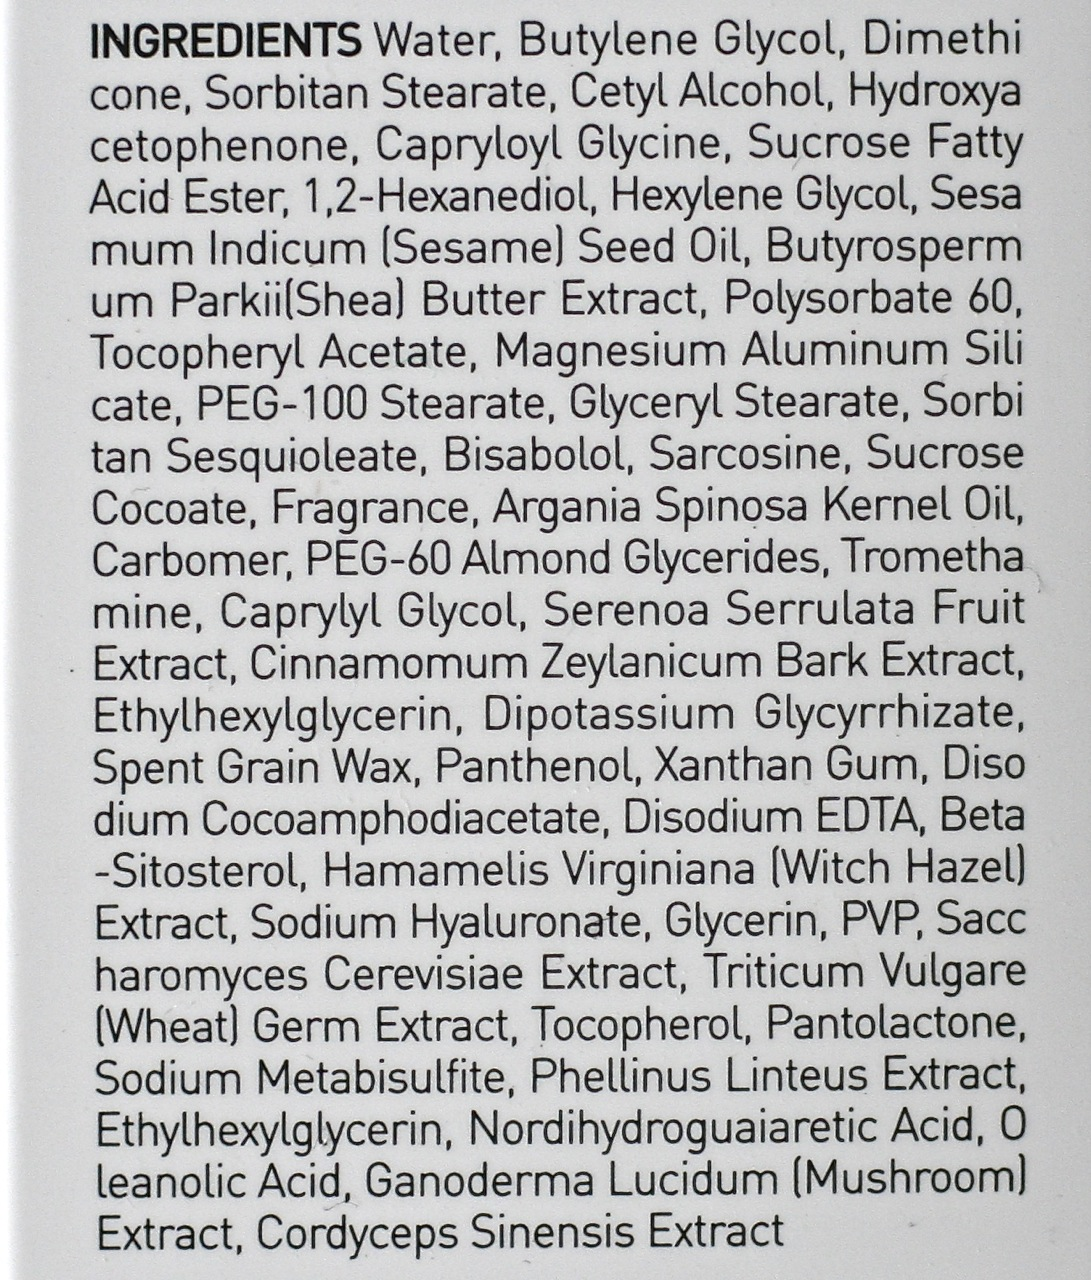 Leegeehaam 5 Alpha Control Emulsion ingredients